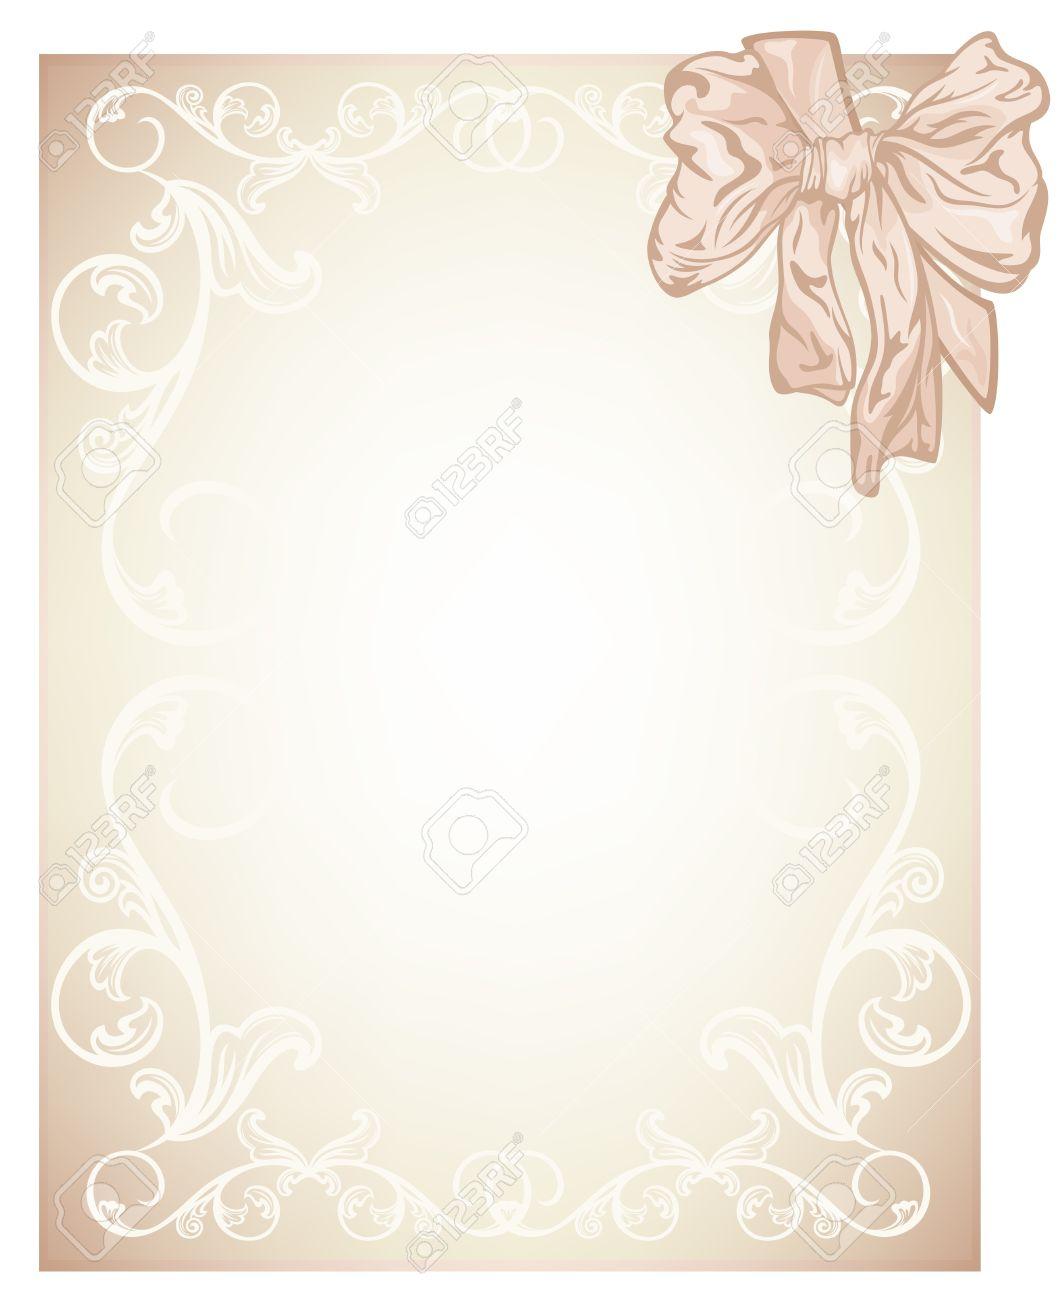 elegant beige blank for wedding invitation or certificate card